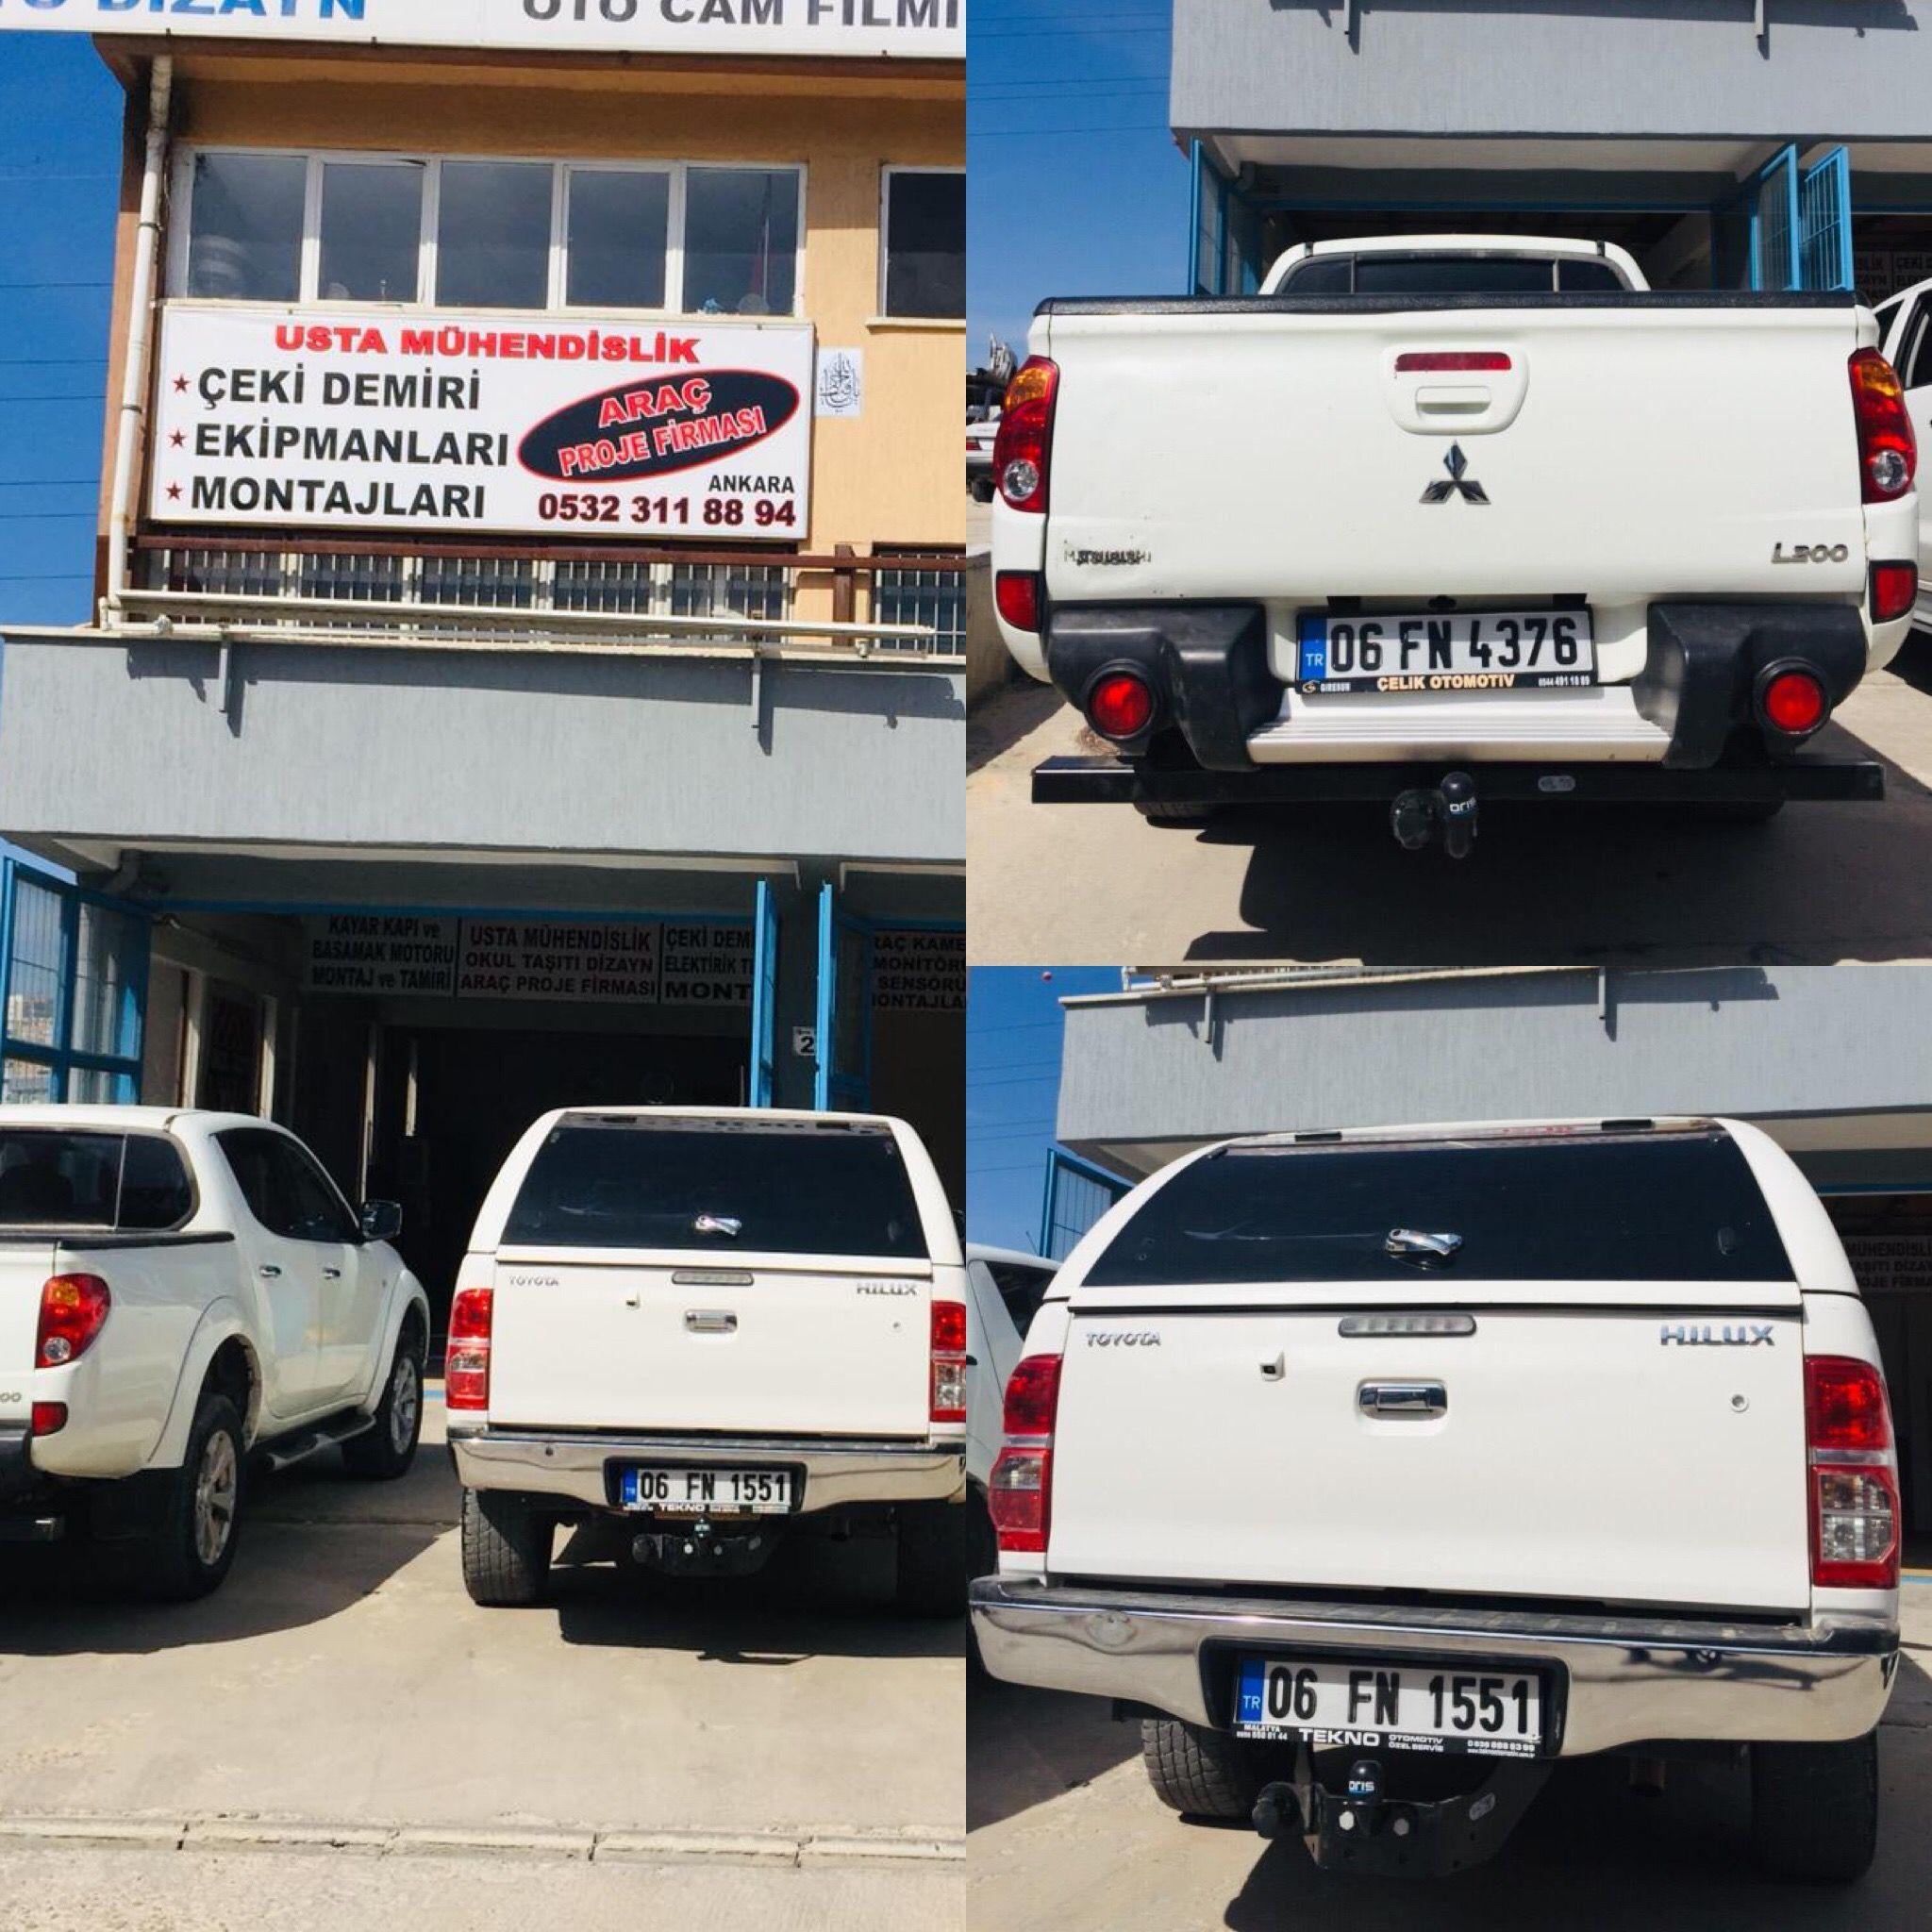 Usta Muhendislik Ankara Ceki Demiri Sistemi Montaj Servisi Arac Proje Firmasi Toyota Ford Ranger Ankara